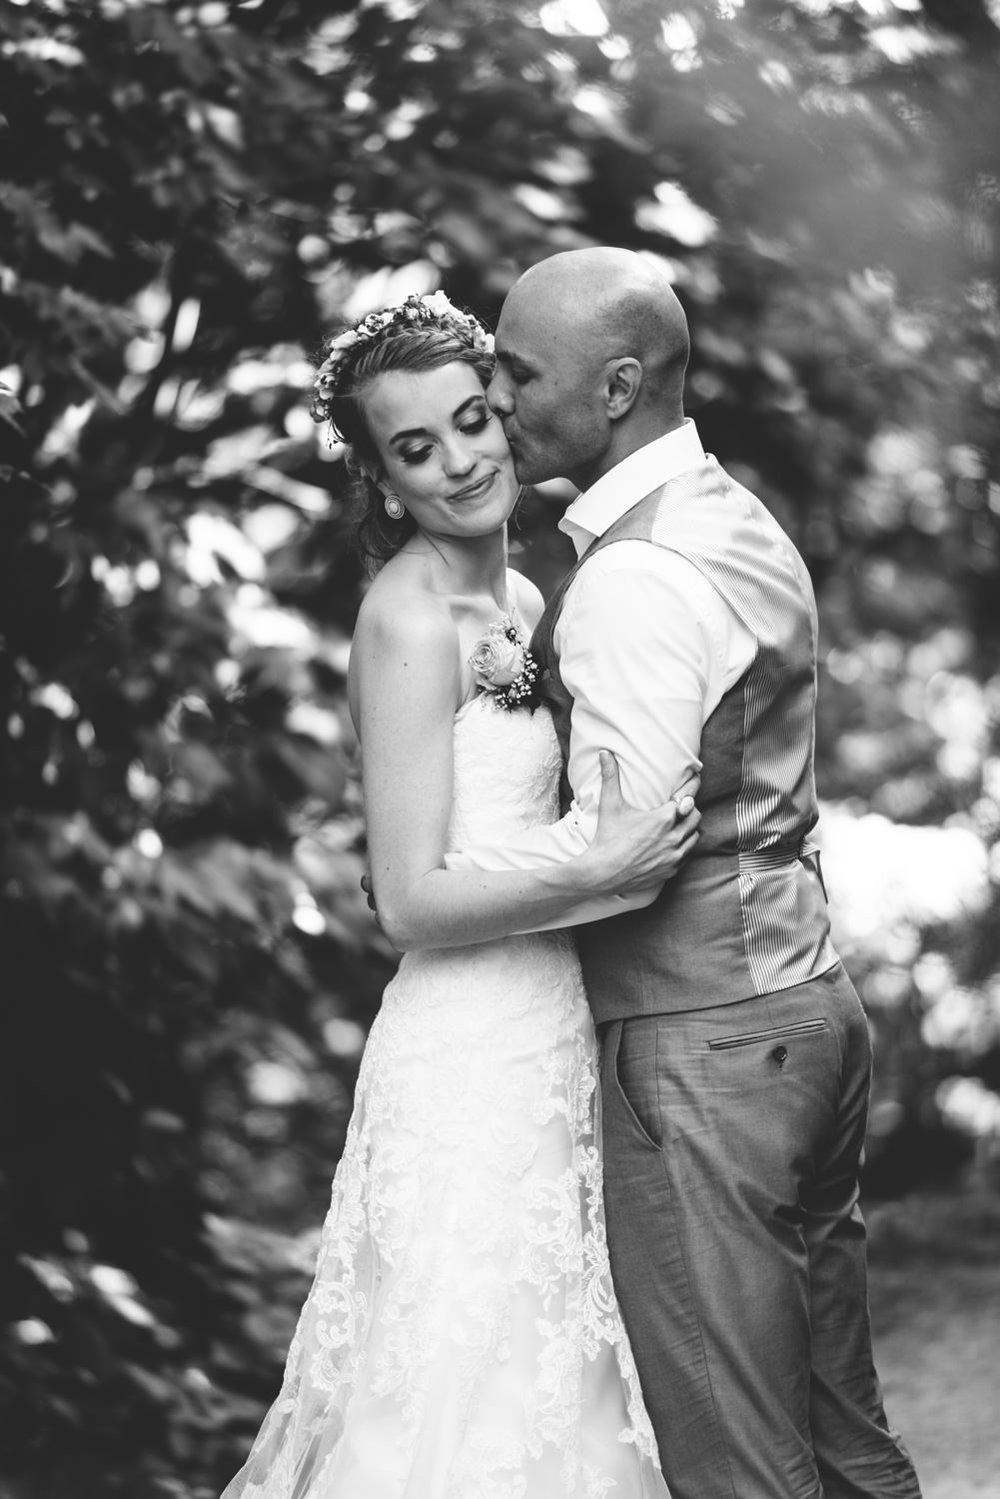 Fotograf-Martin-Bonden-bryllup-sveits-basel-bw.jpg